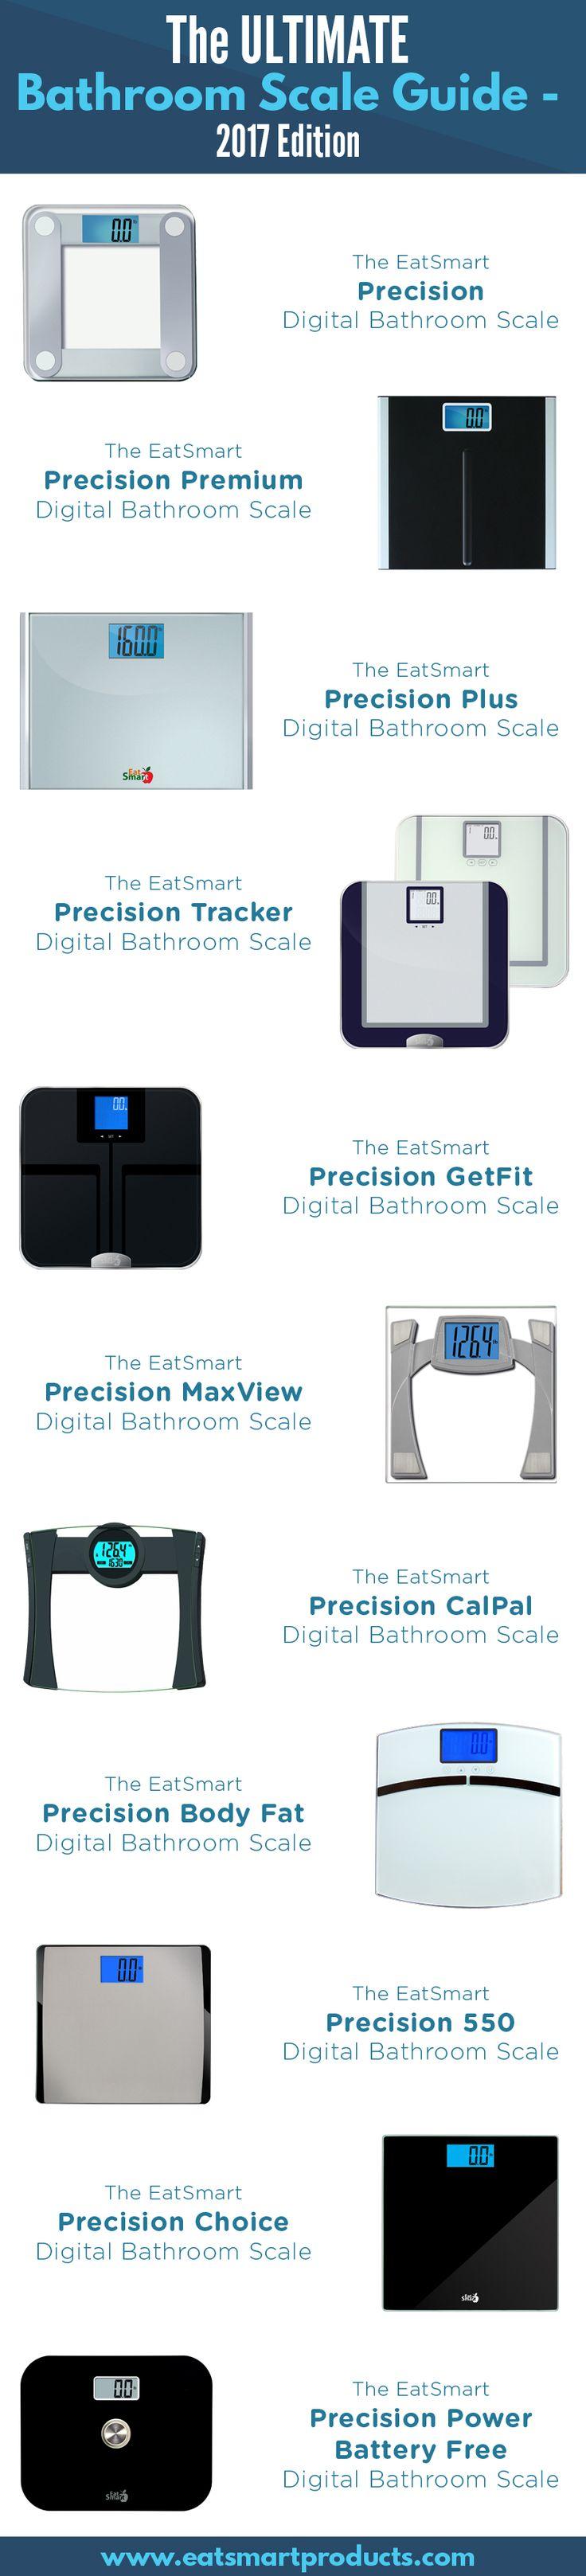 Product spotlight meet the eatsmart precision digital bathroom scale - Find This Pin And More On Eatsmart Blog Posts By Eatsmartscales